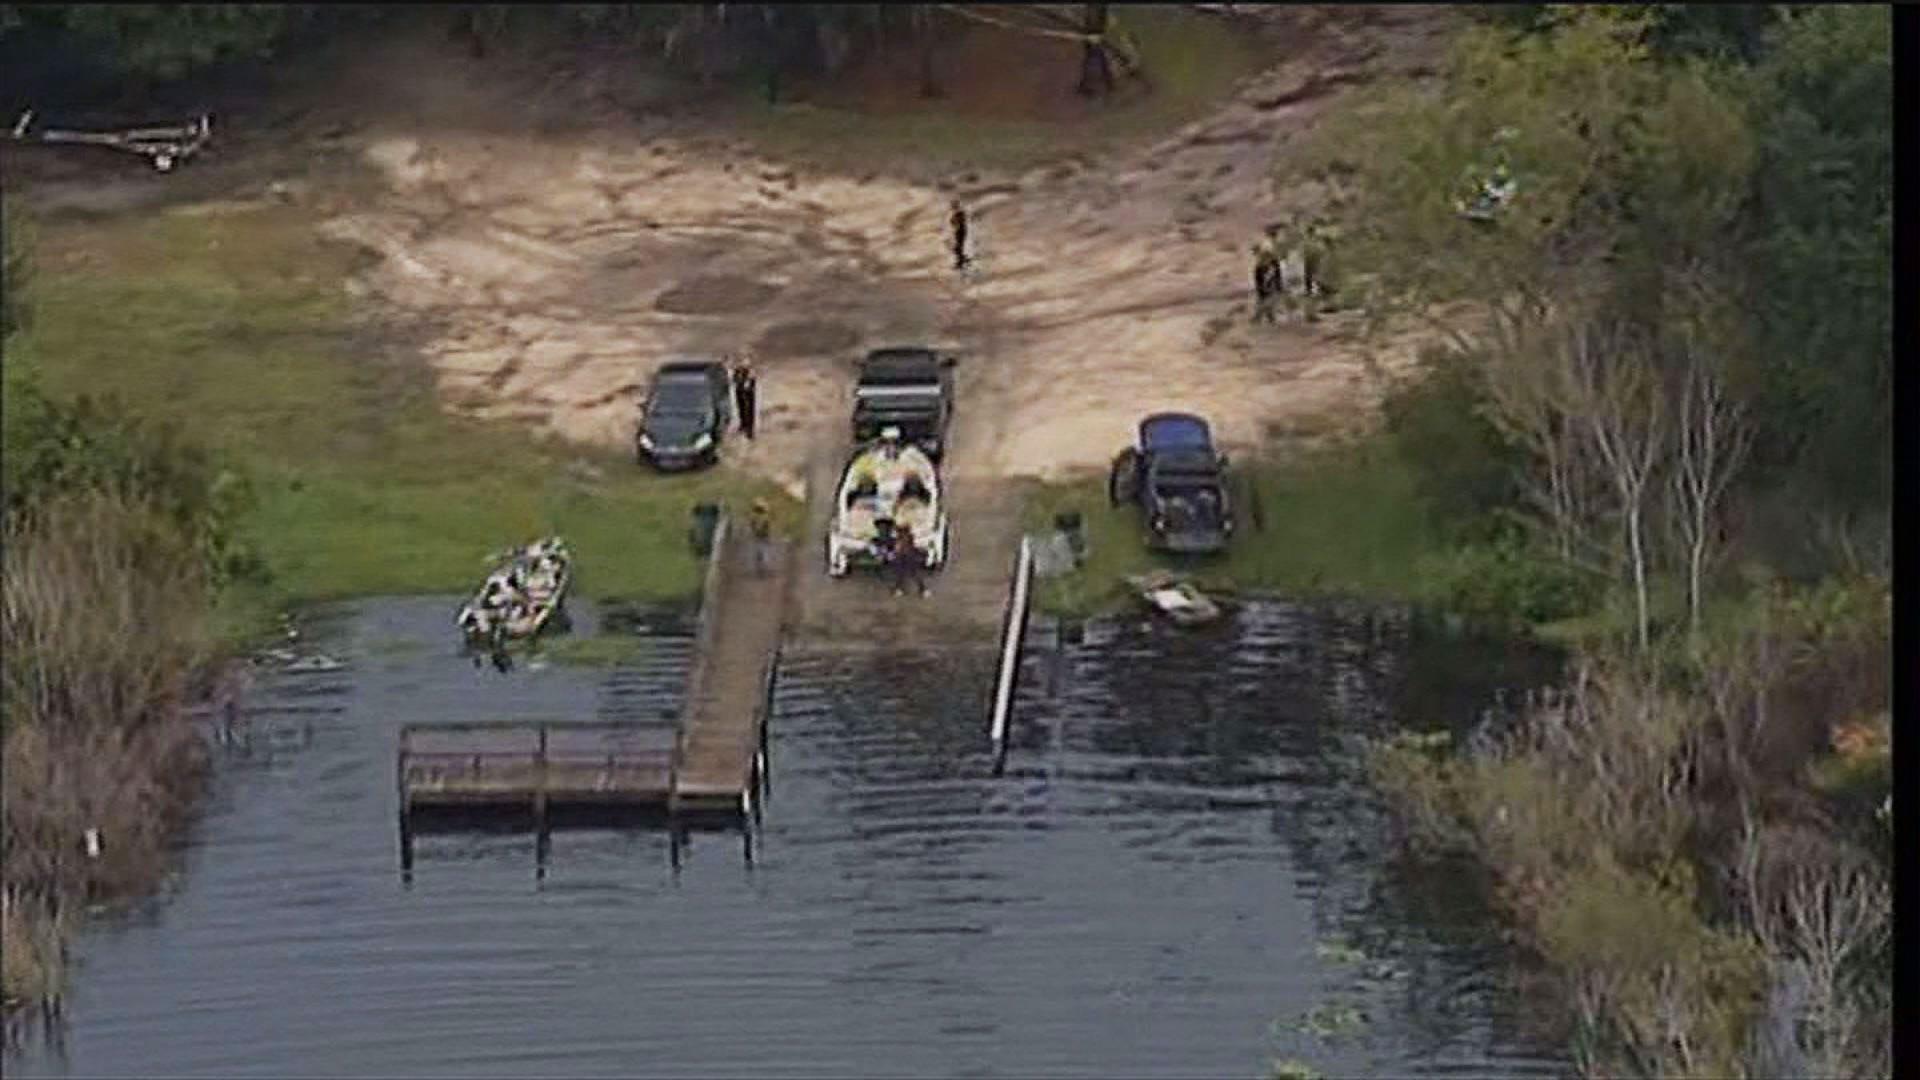 Lake fannie boat ramp